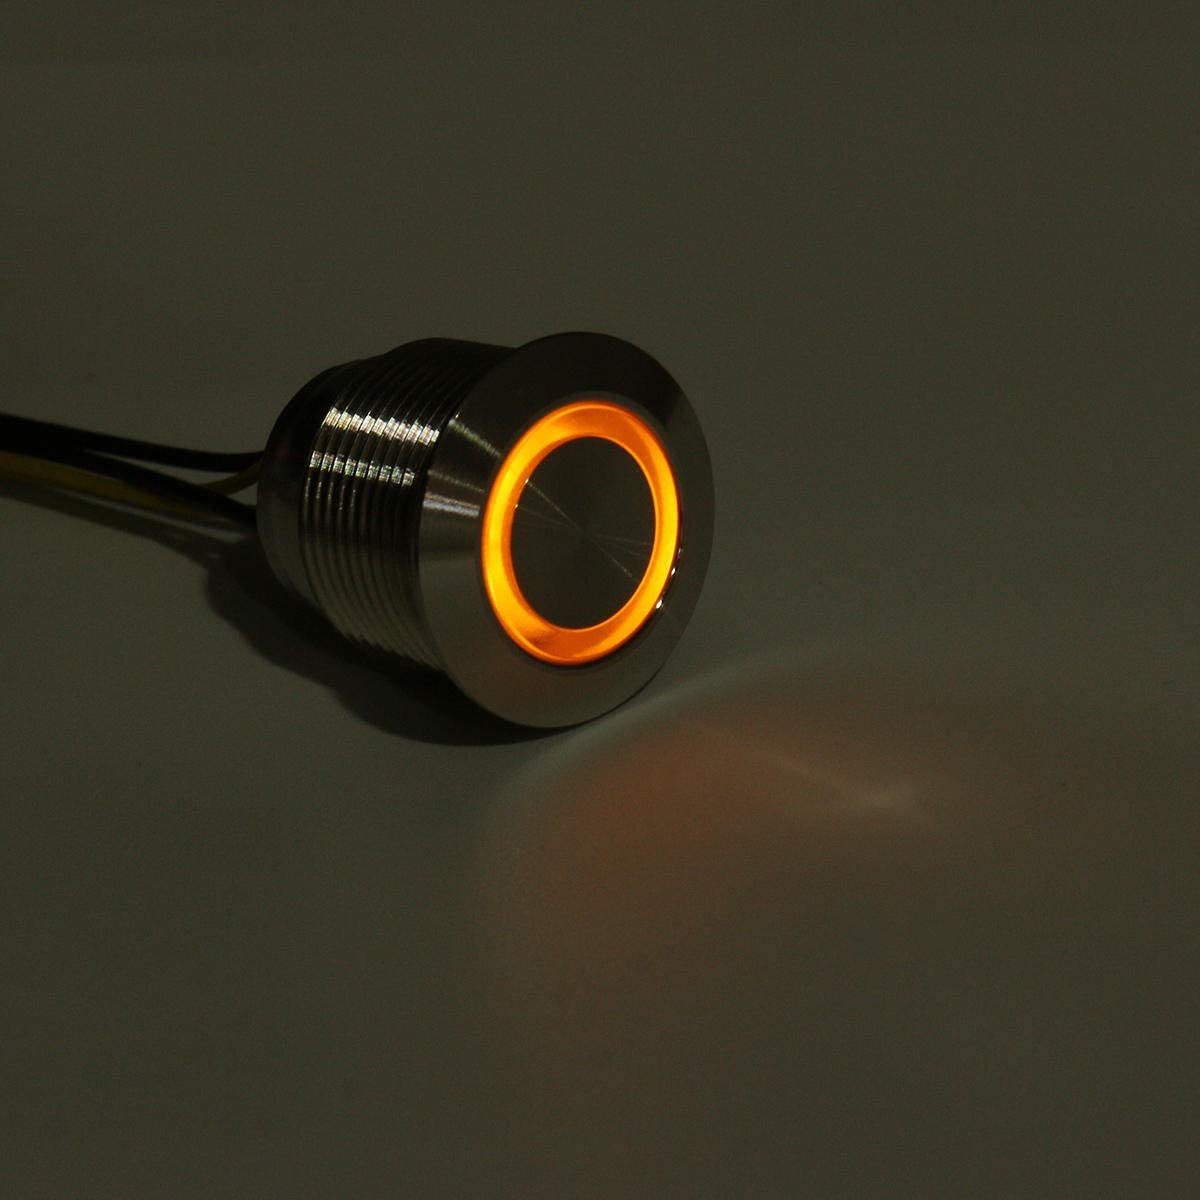 NLXTXQC Car 12V 19mm LED Push Button Switch Sacramento Mall Dash Momentary Max 88% OFF Panel